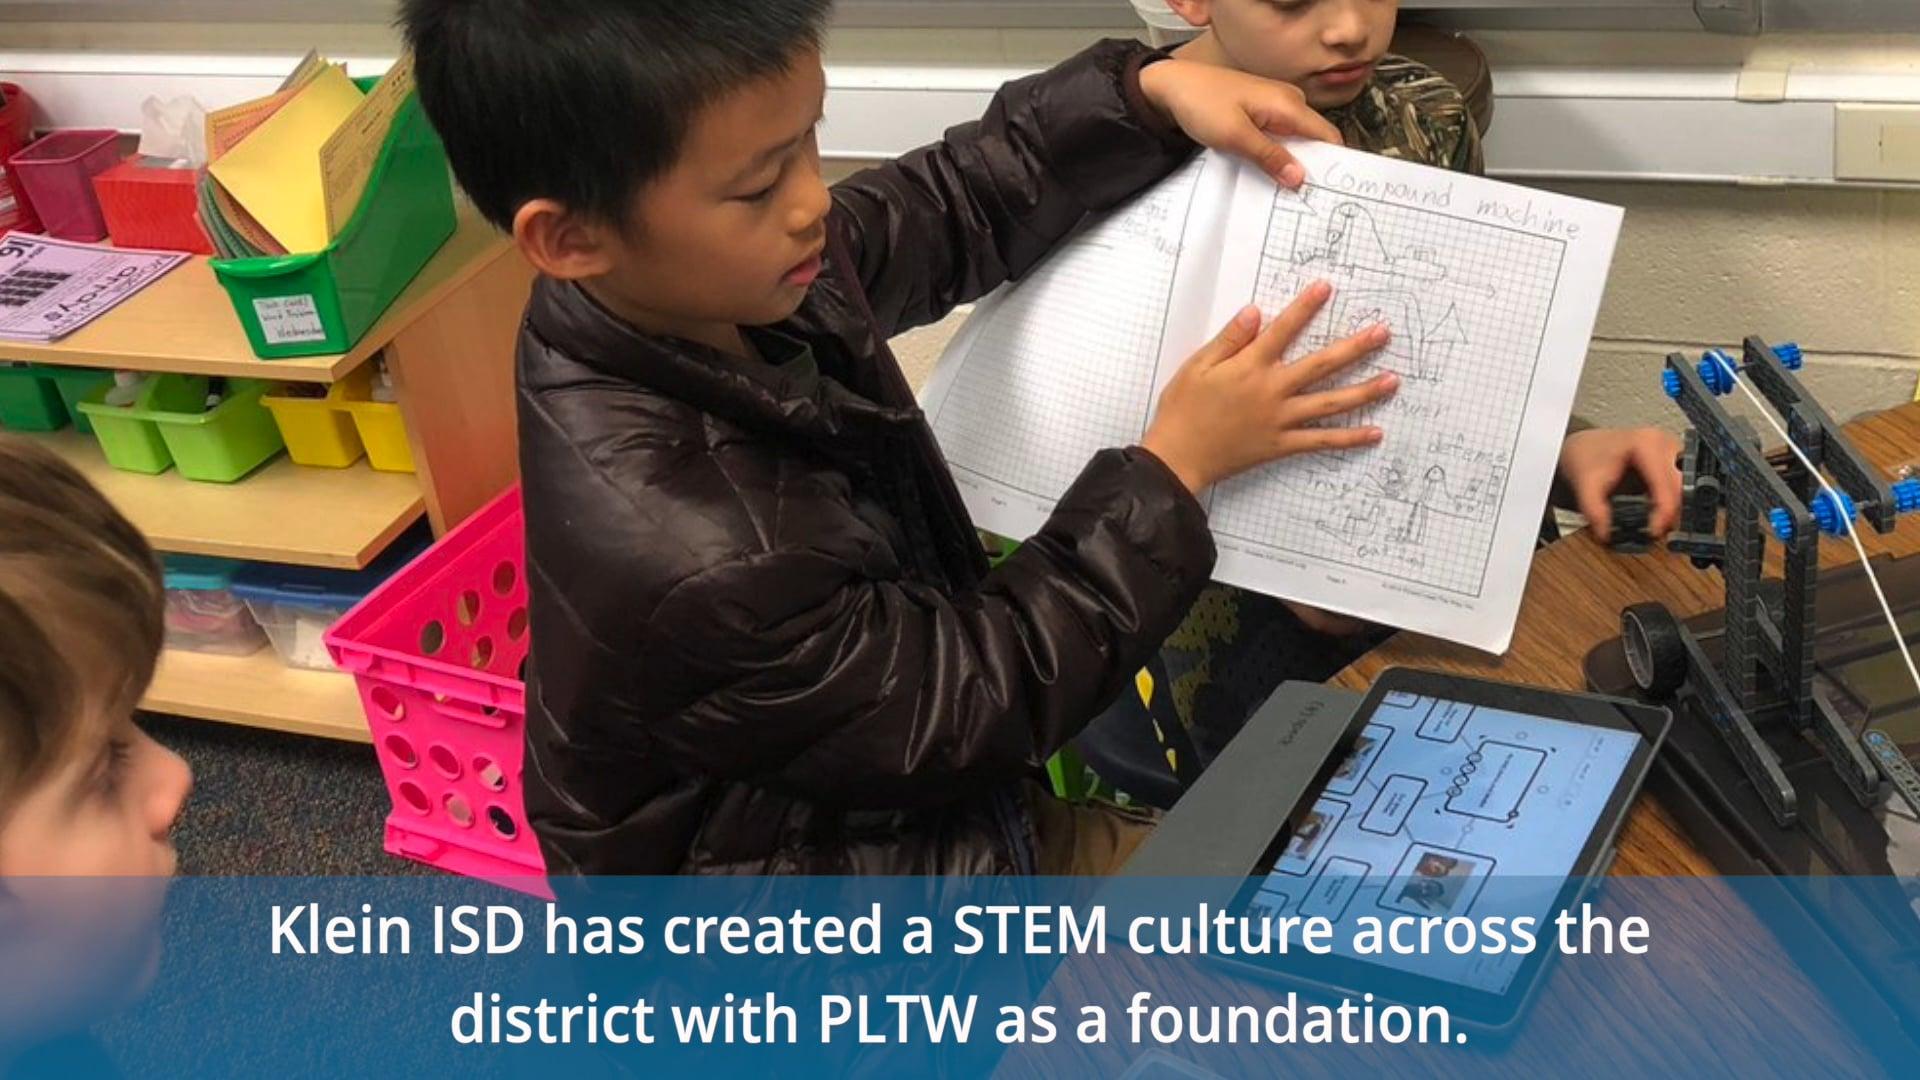 Klein ISD Chosen to Showcase STEM Curriculum and Culture